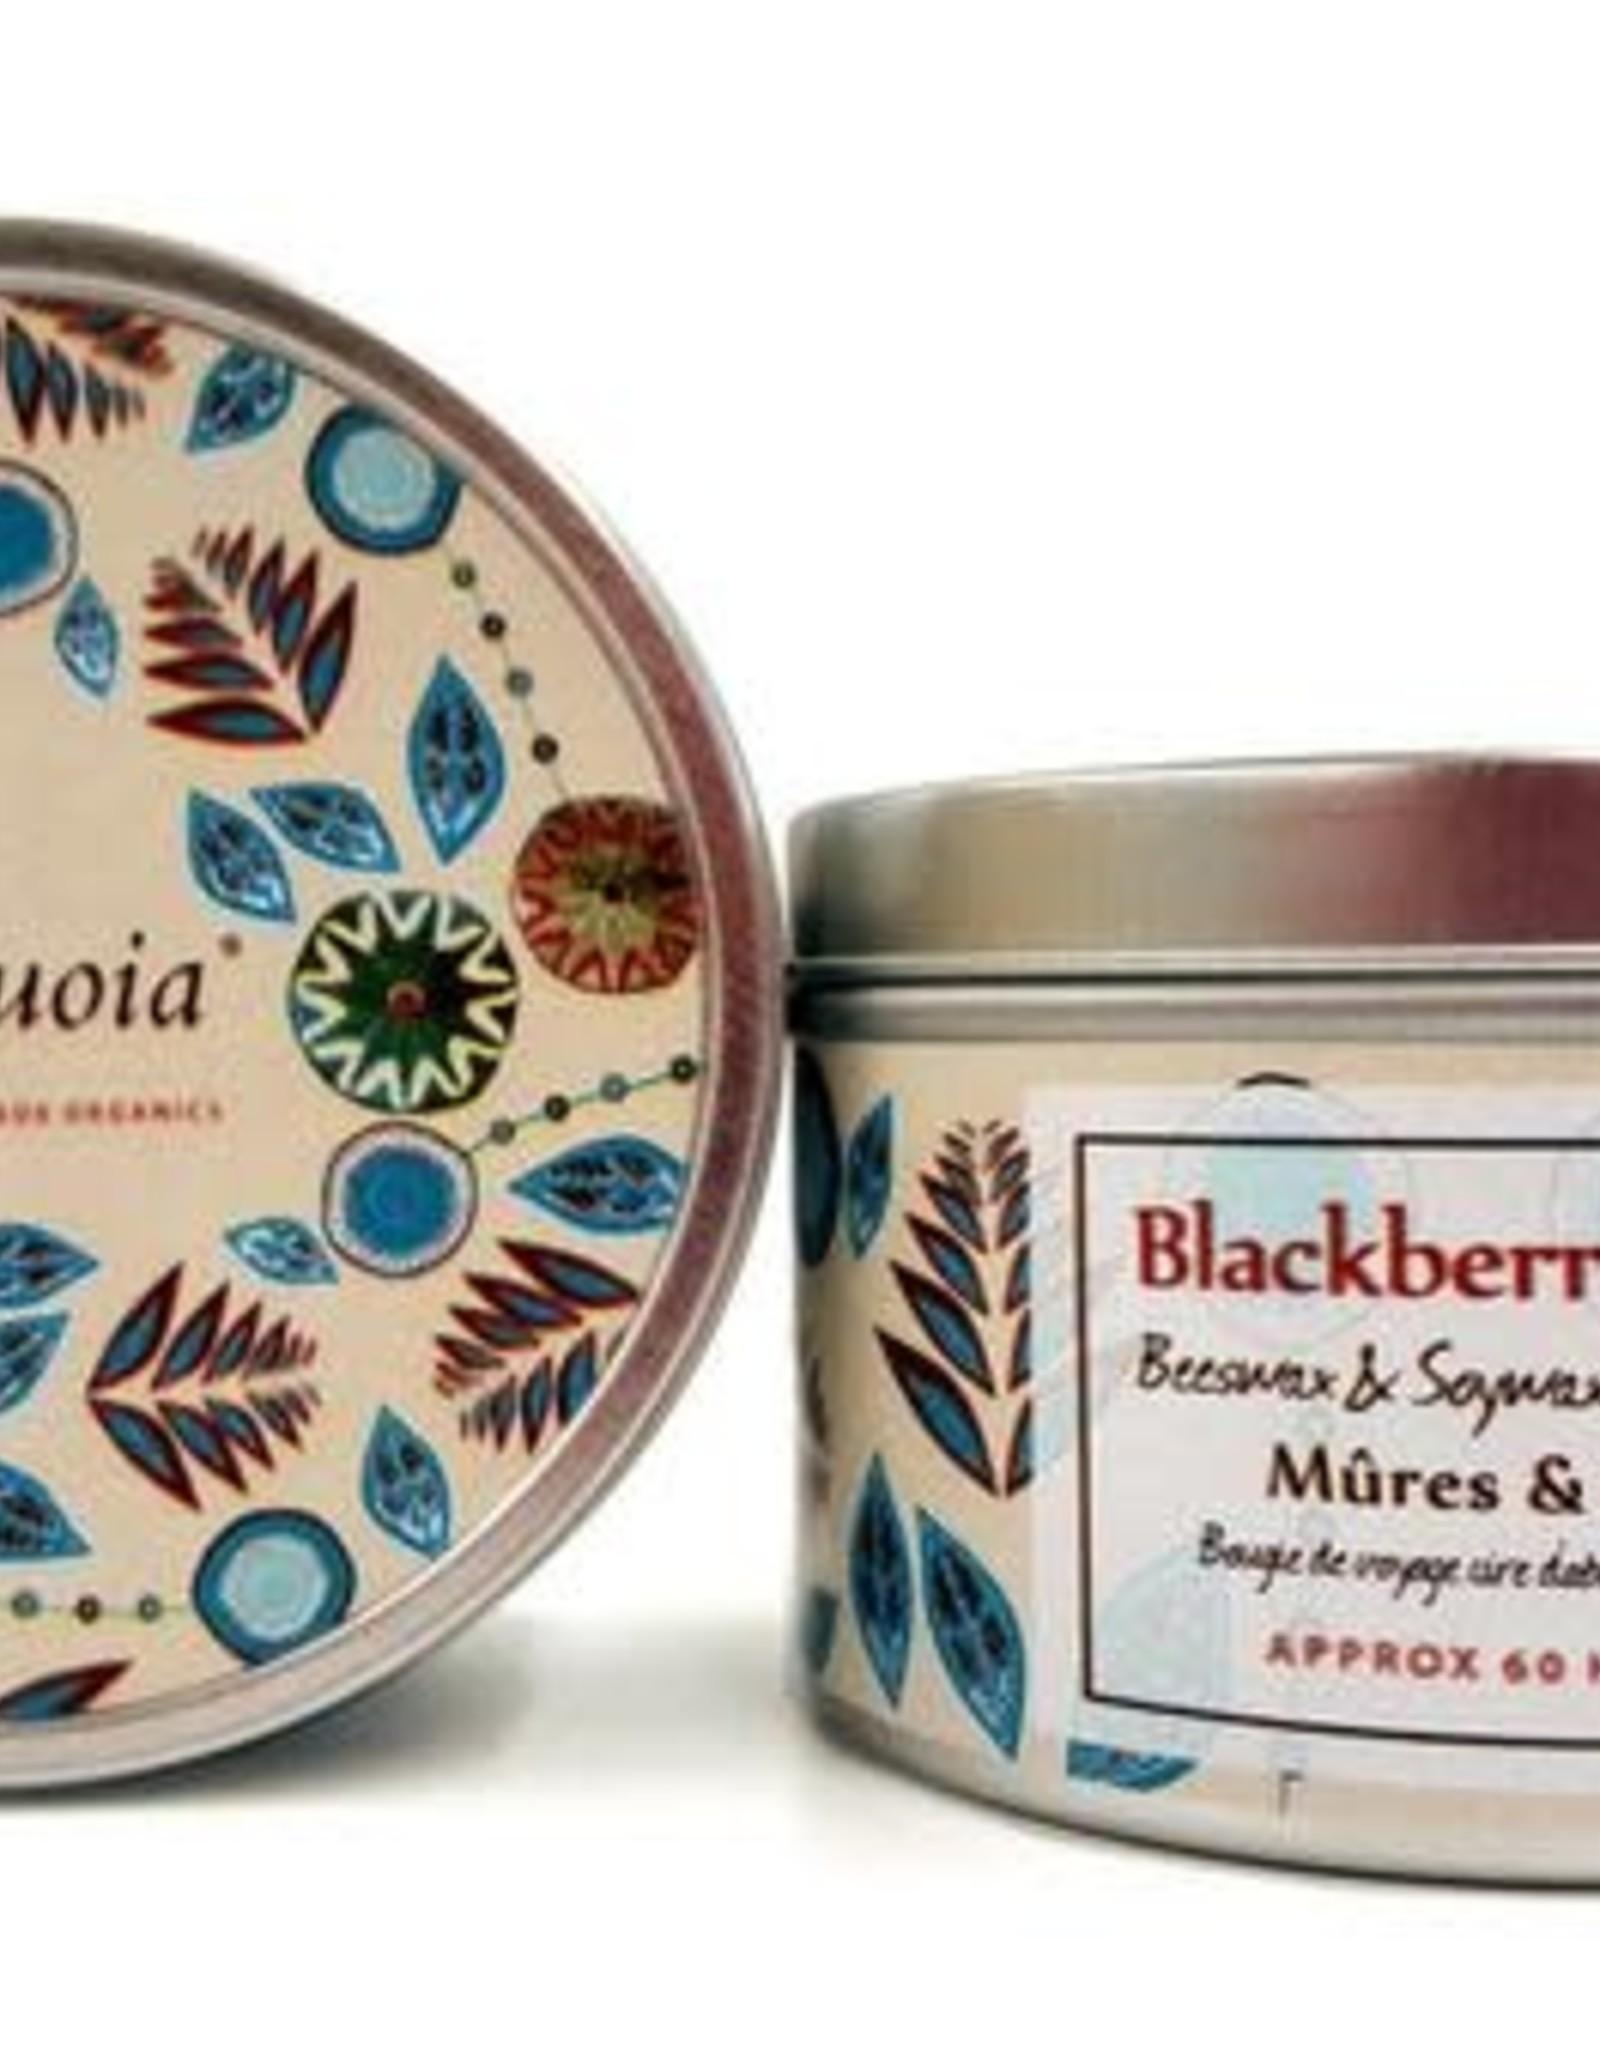 Sequoia 30 hr Candle - Blackberry Sage